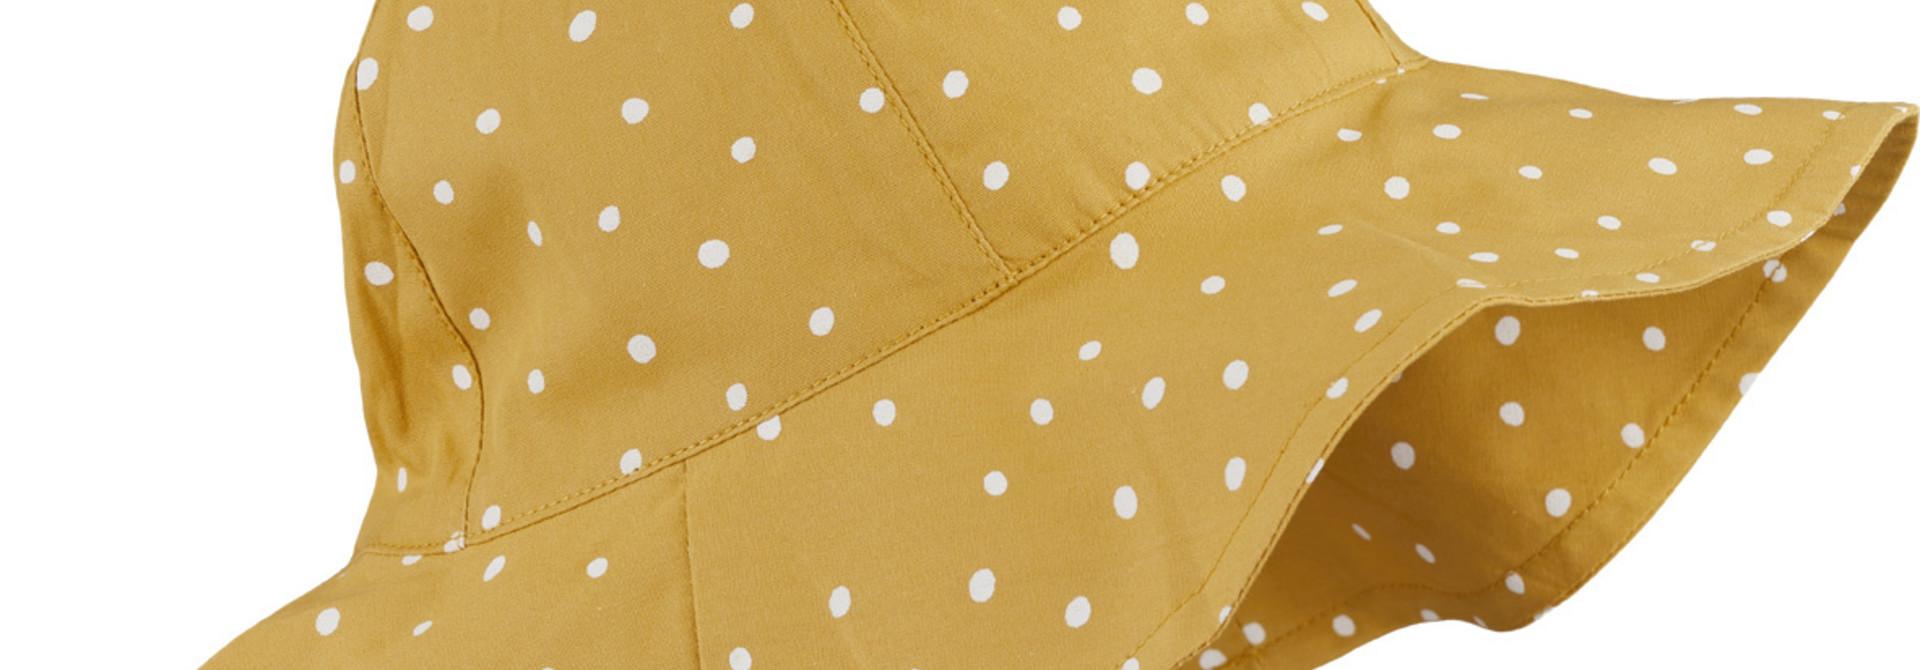 Amelia sun hat - Confetti yellow mellow mix